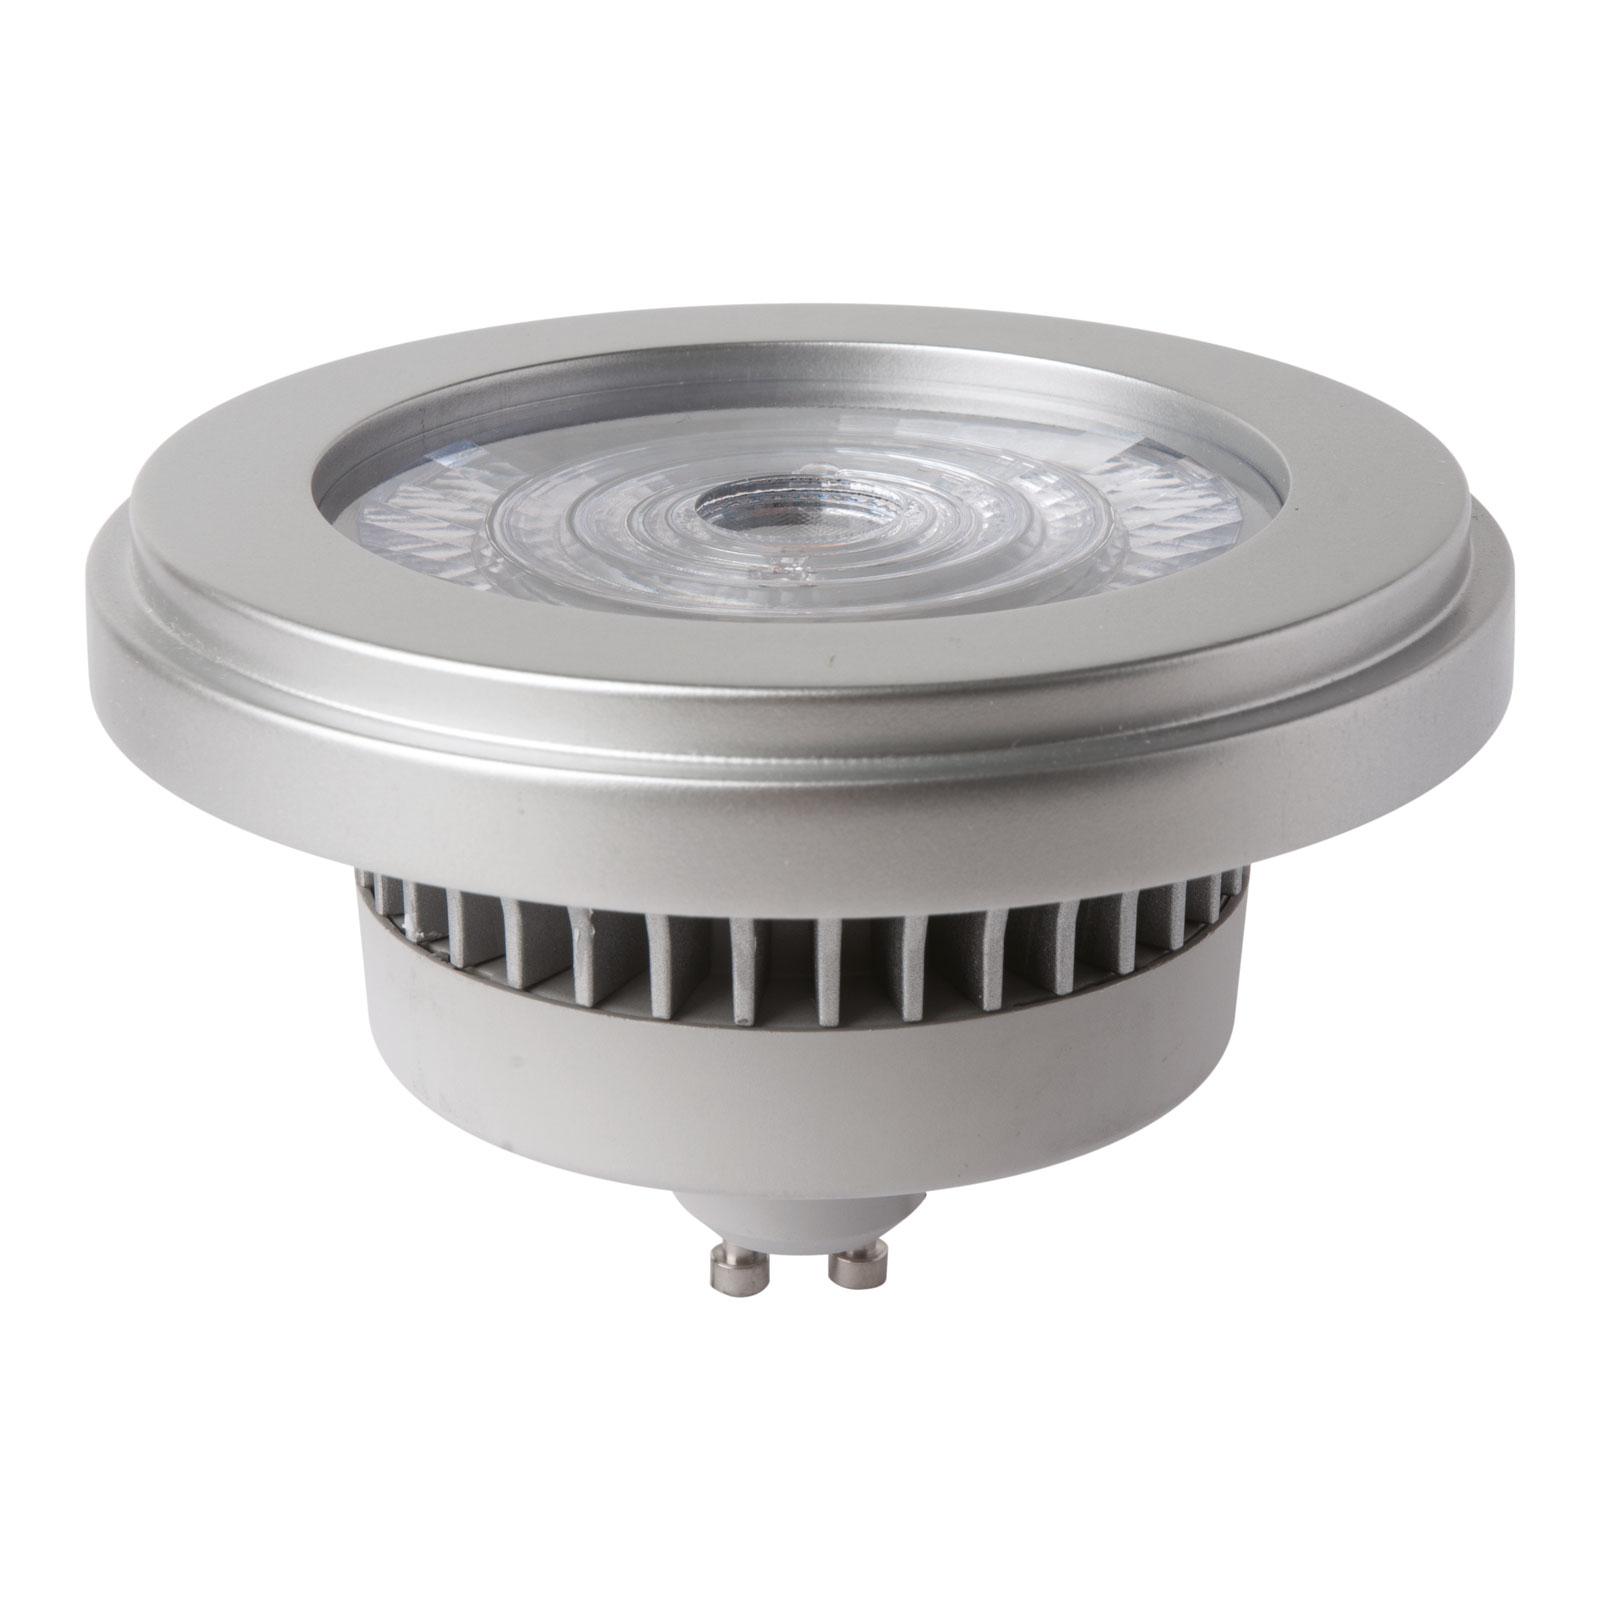 Riflettore LED GU10 11W Dual Beam bianco neutro